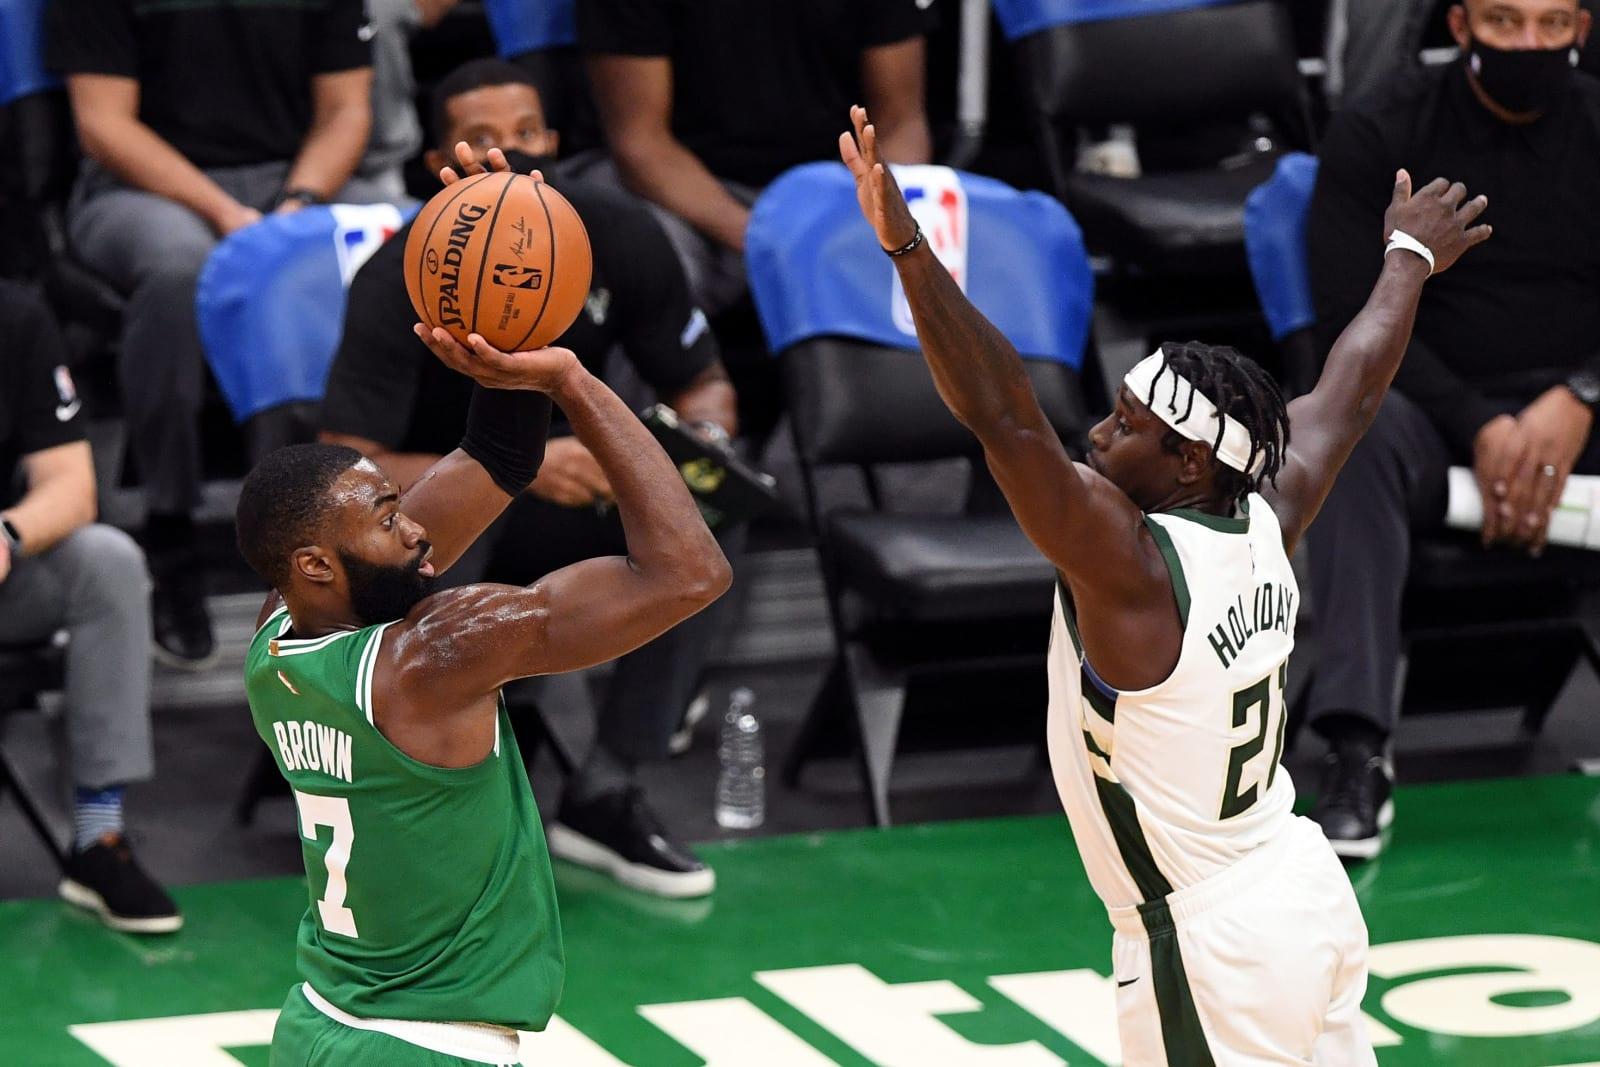 Milwaukee Bucks: 3 factors behind slide in 3-point defense